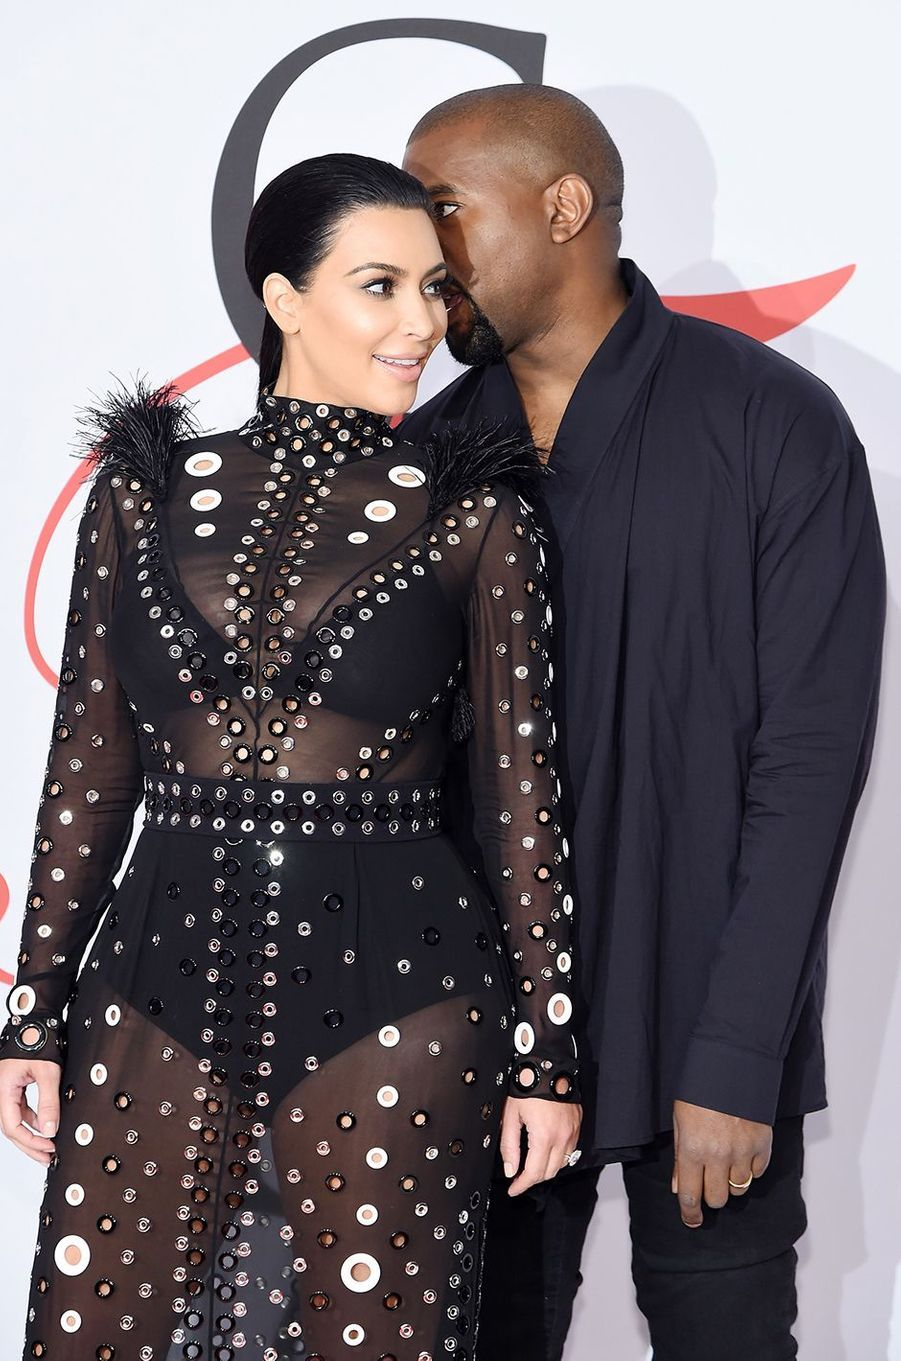 Kim Kardashian et Kanye West aux CFDA Fashion Awards à New York en juin 2015